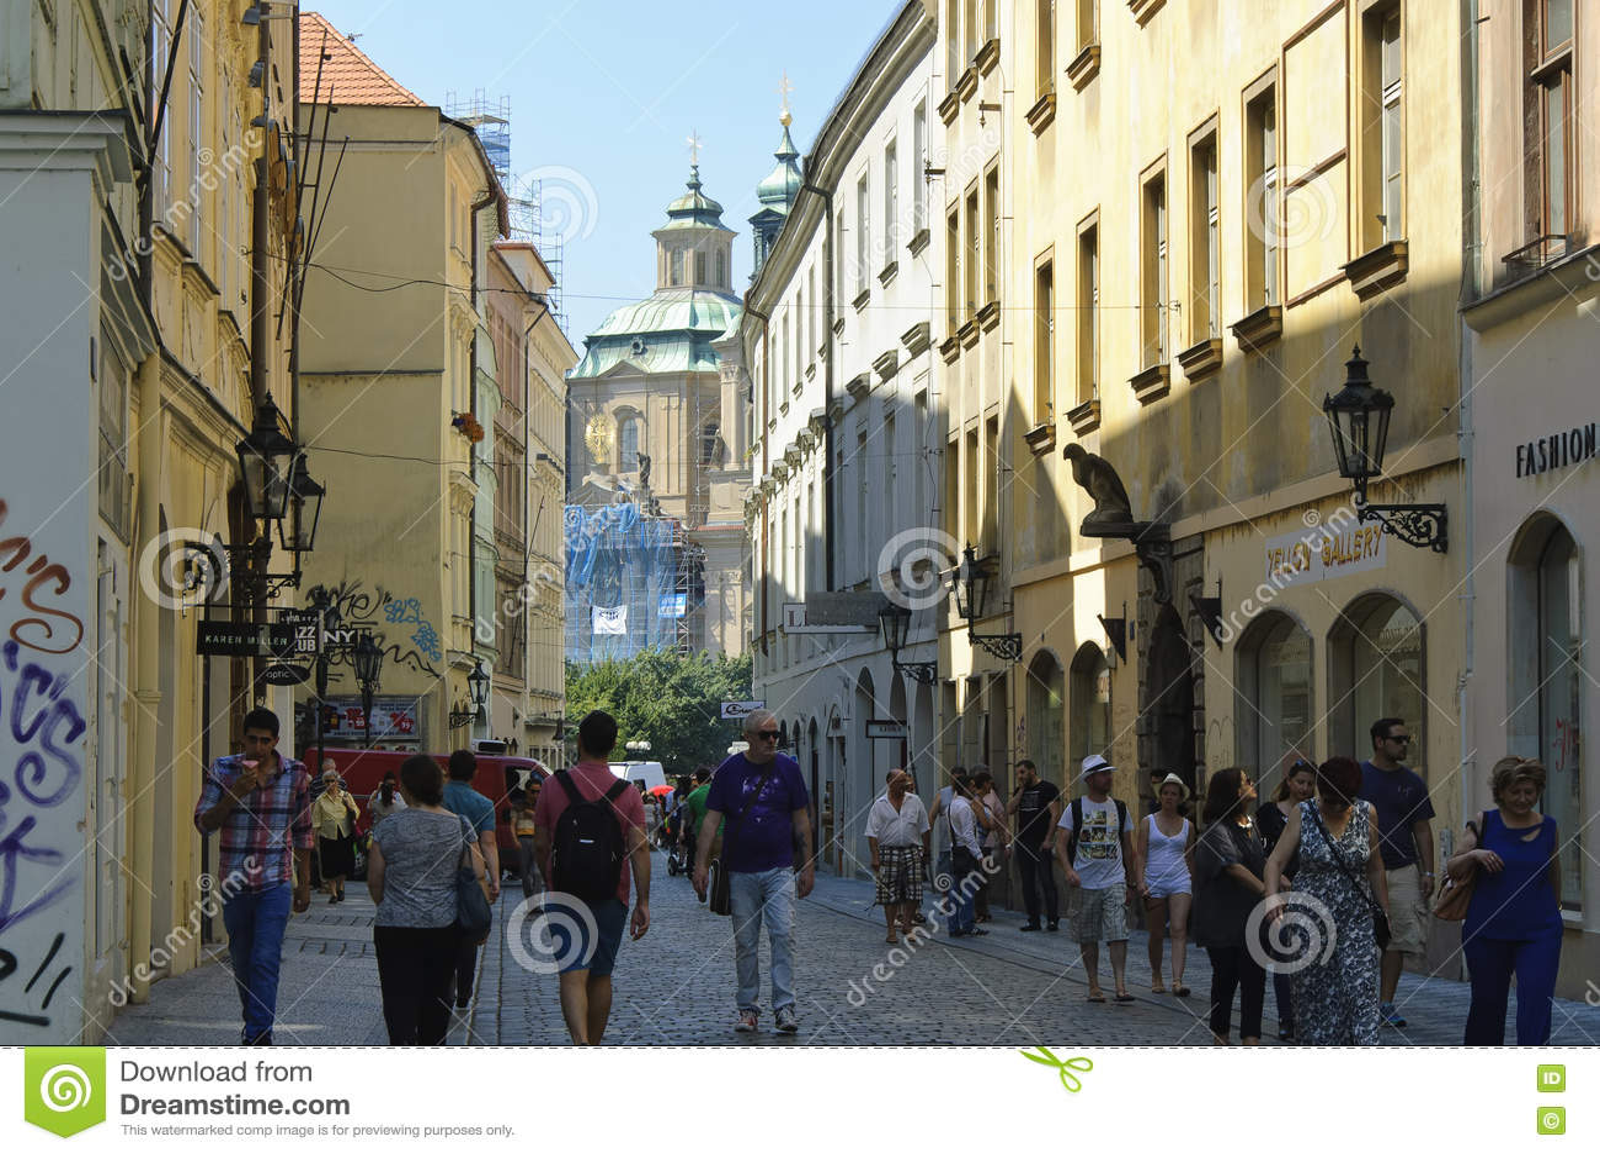 czech streets freevideo z